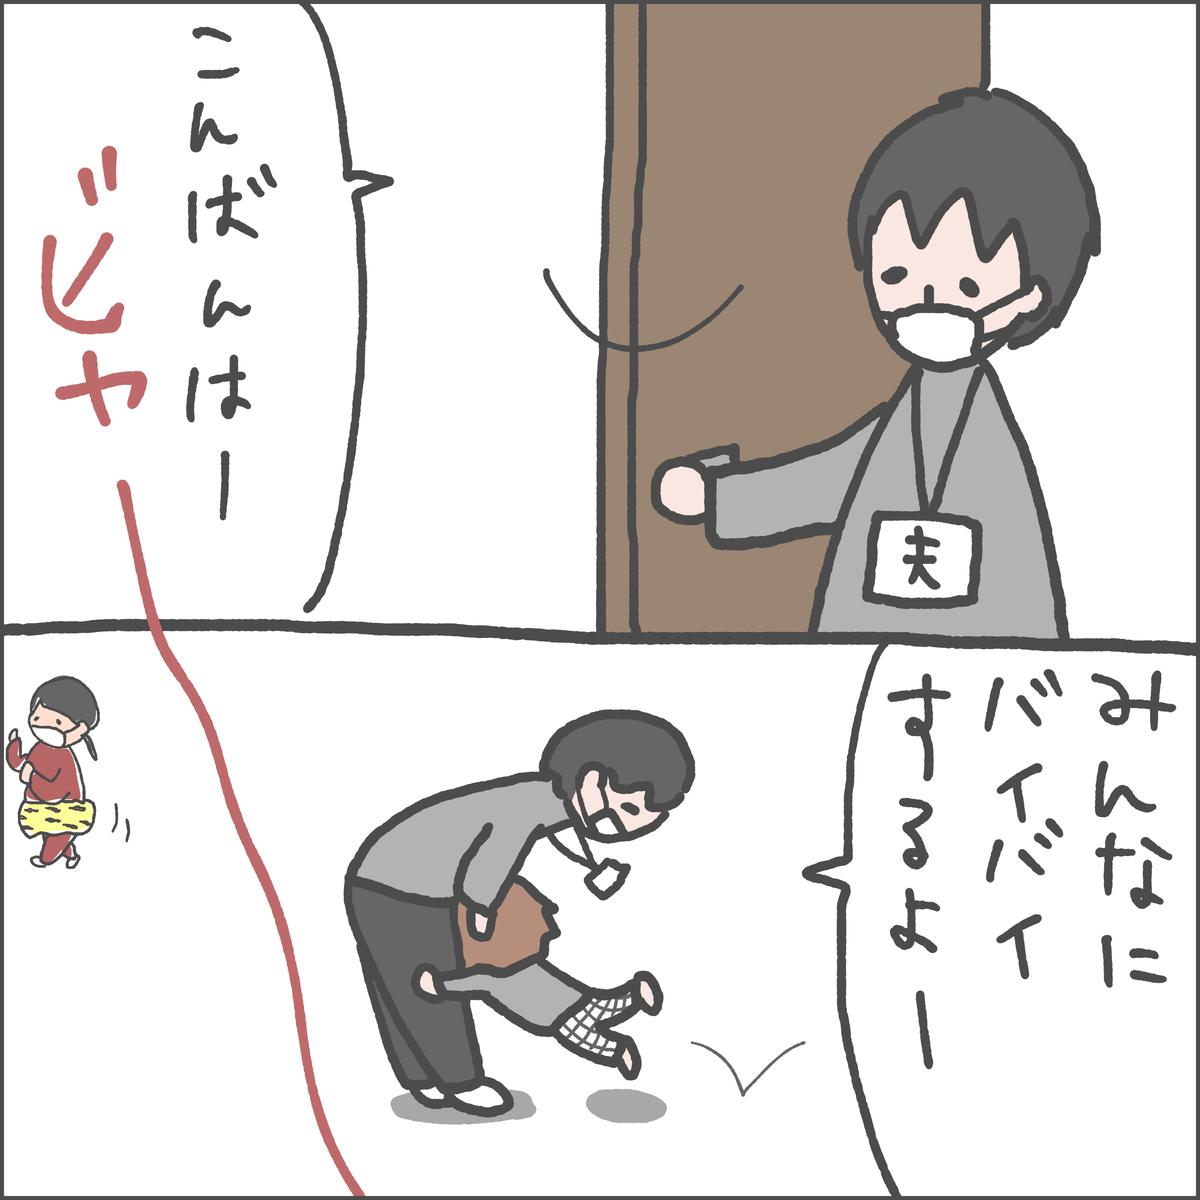 f:id:ika_yoshi:20210211060526j:plain